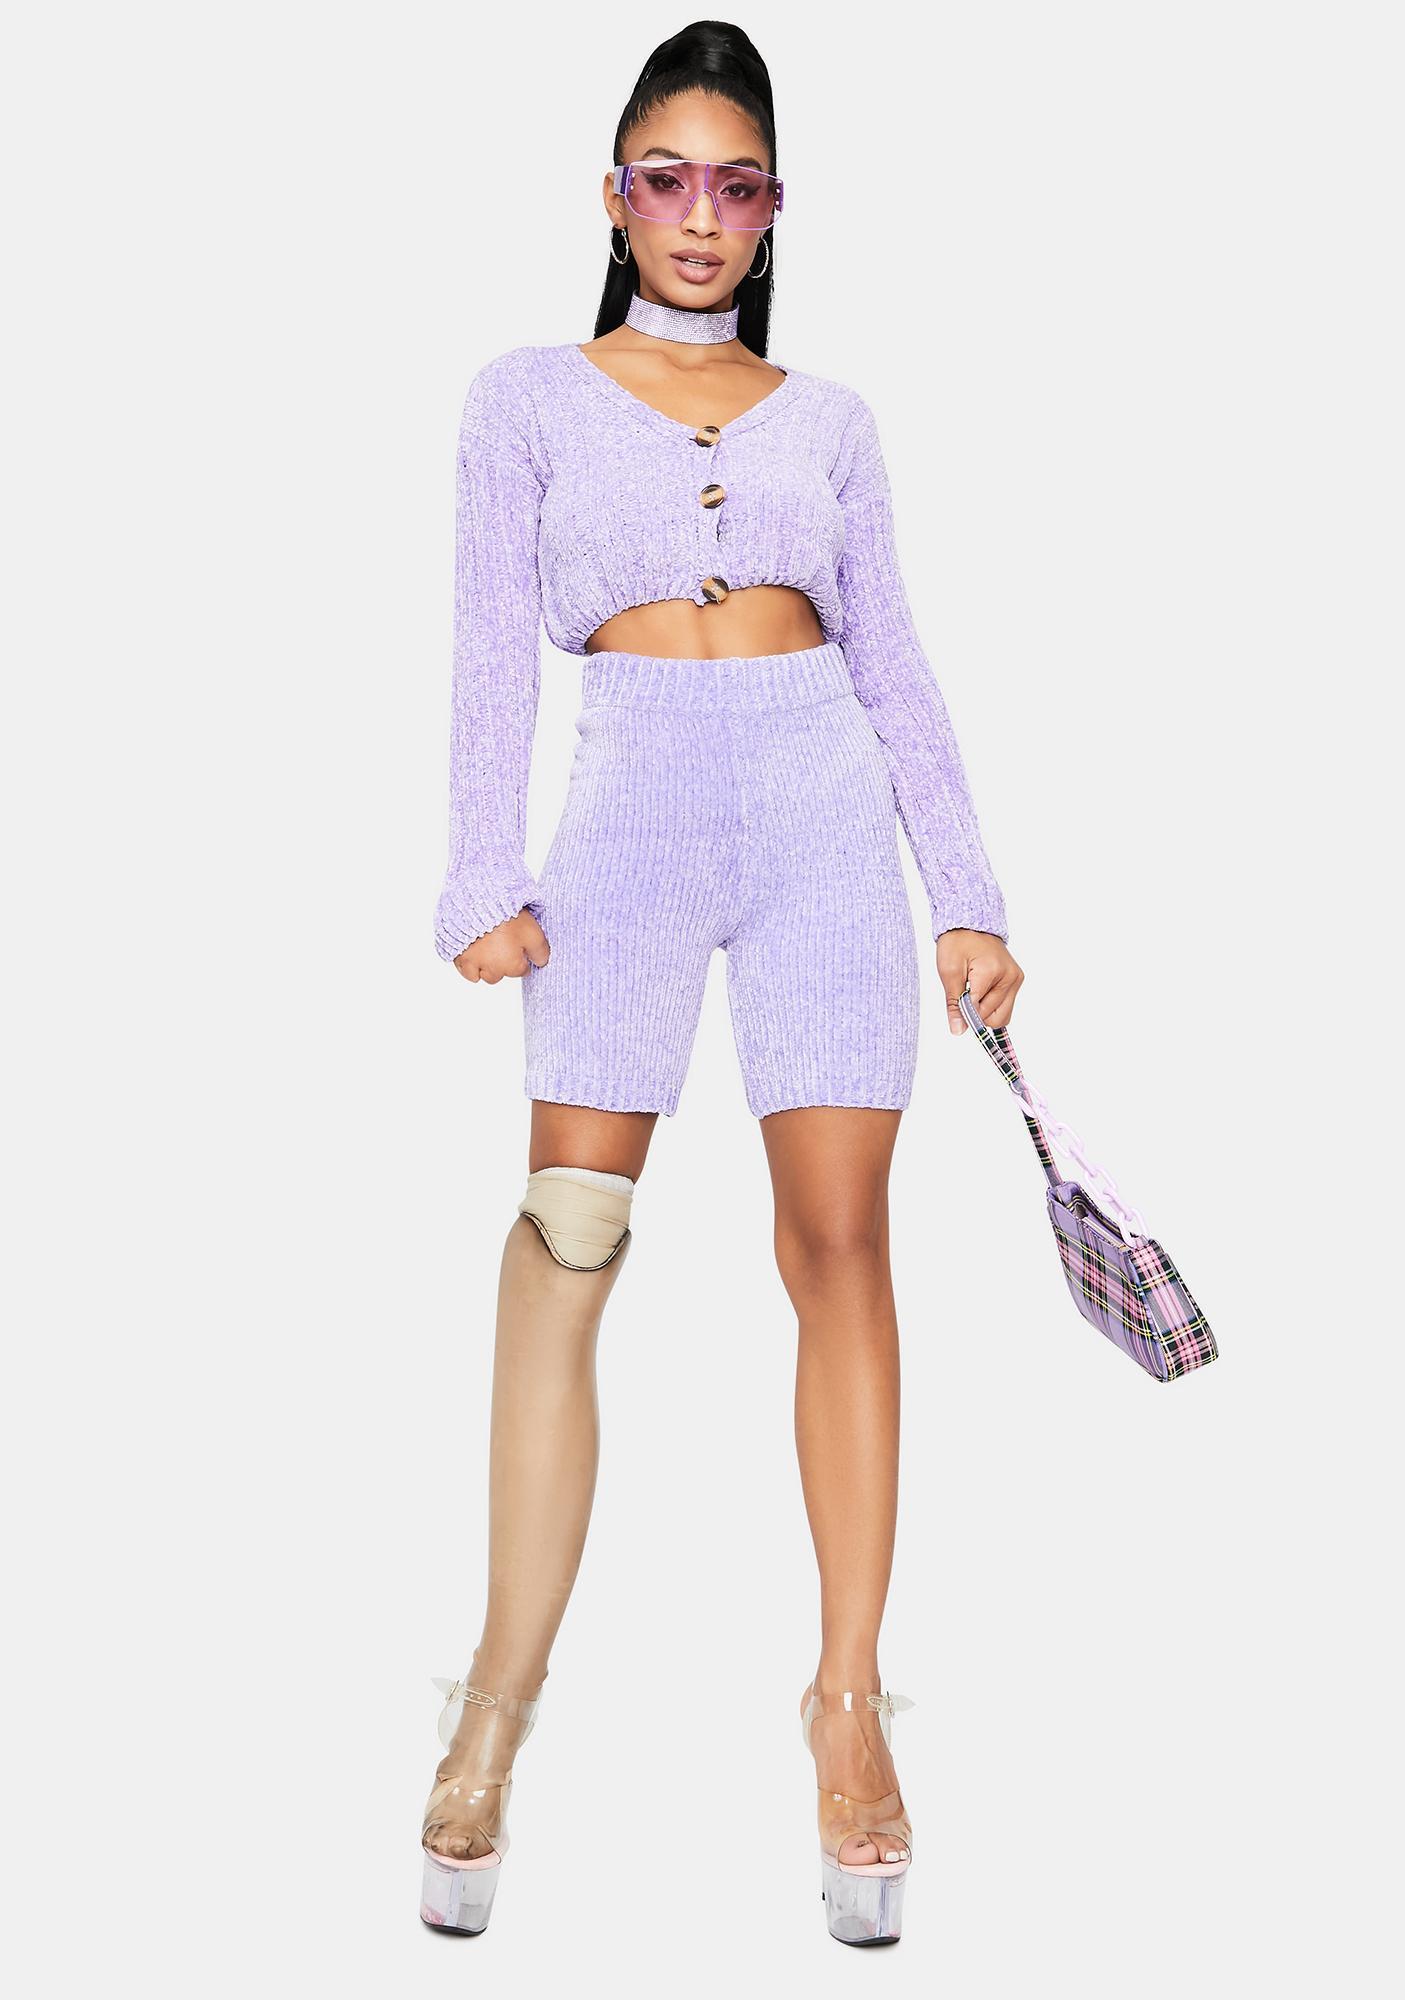 Lilac Luxe in Love Knit Biker Shorts